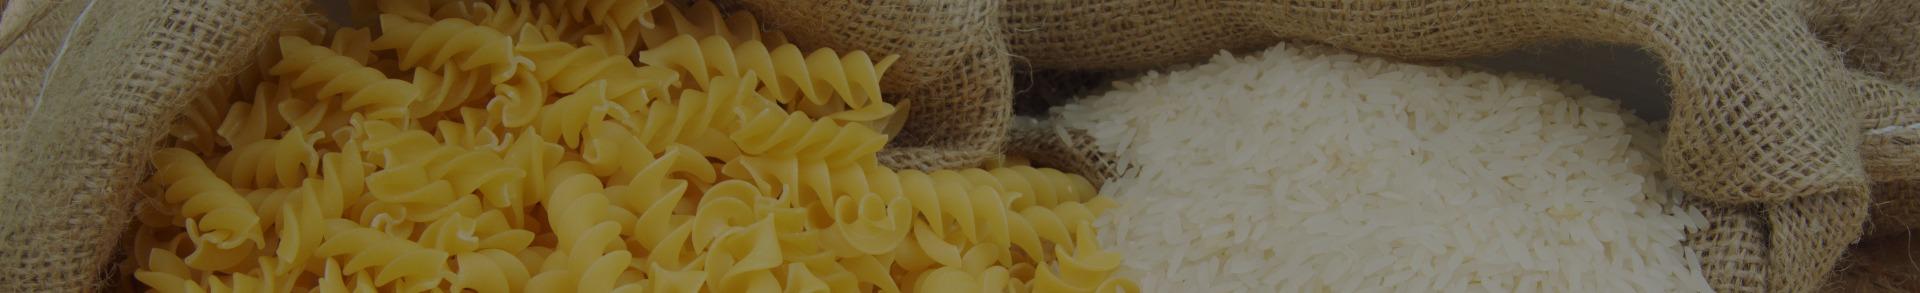 Rice & Pasta